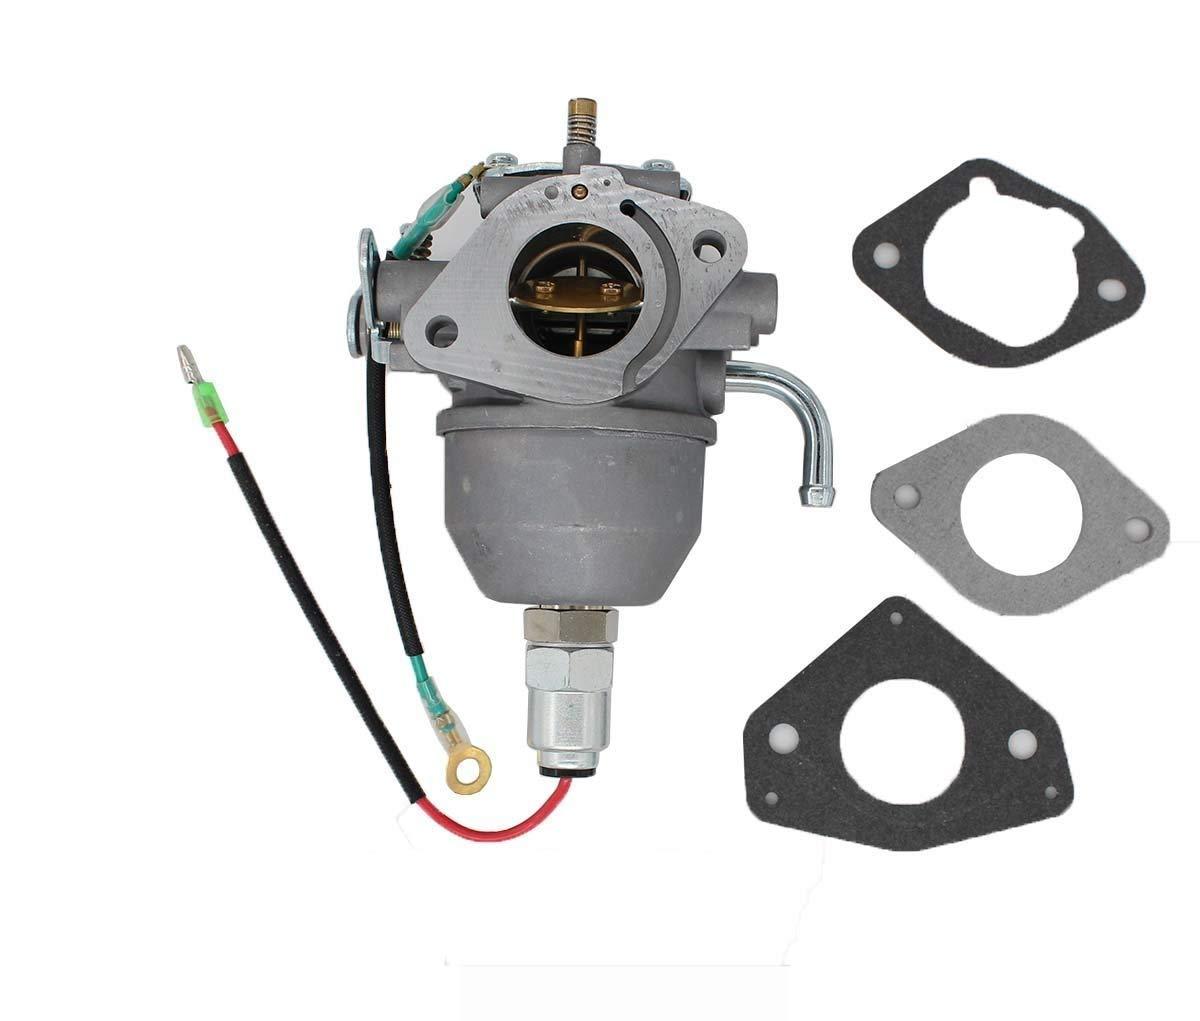 Best Rated in Automotive Replacement Carburetors & Helpful